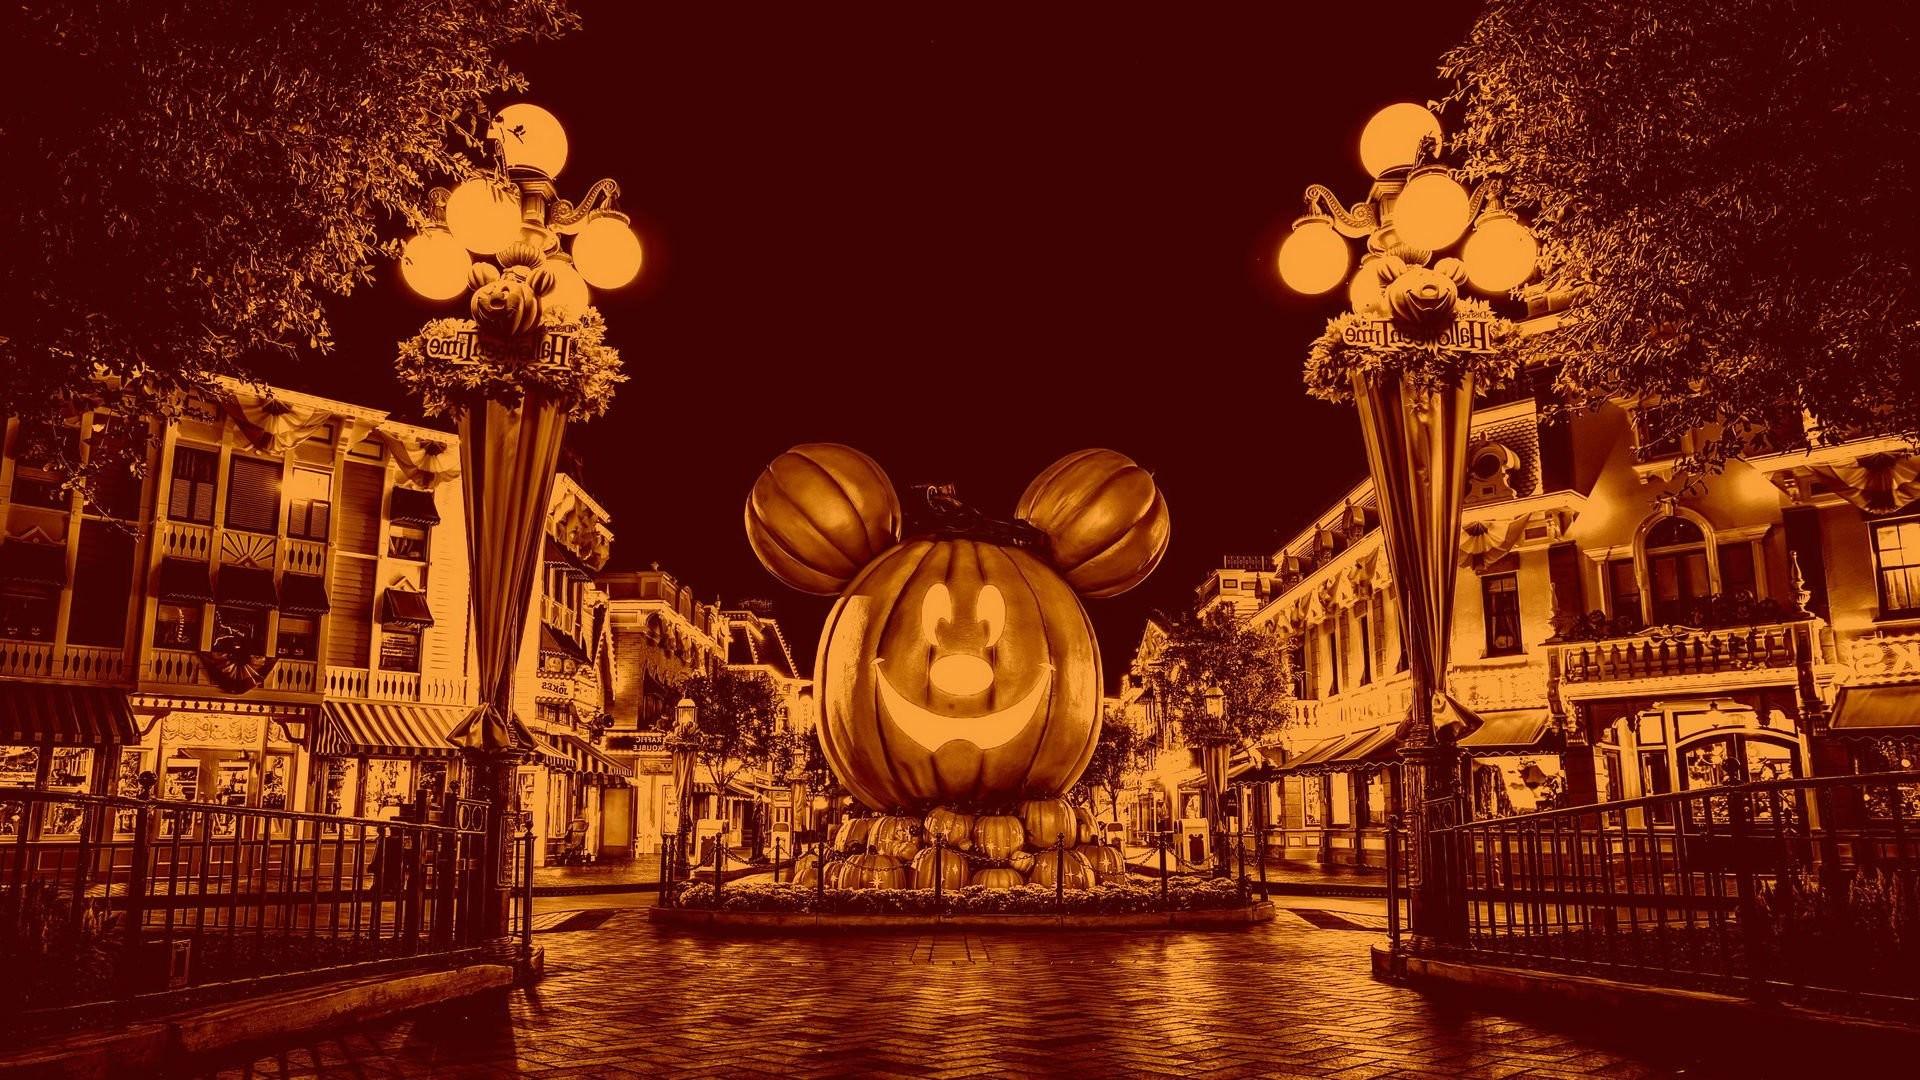 Disney Wallpaper 1920x1080 (74+ images)